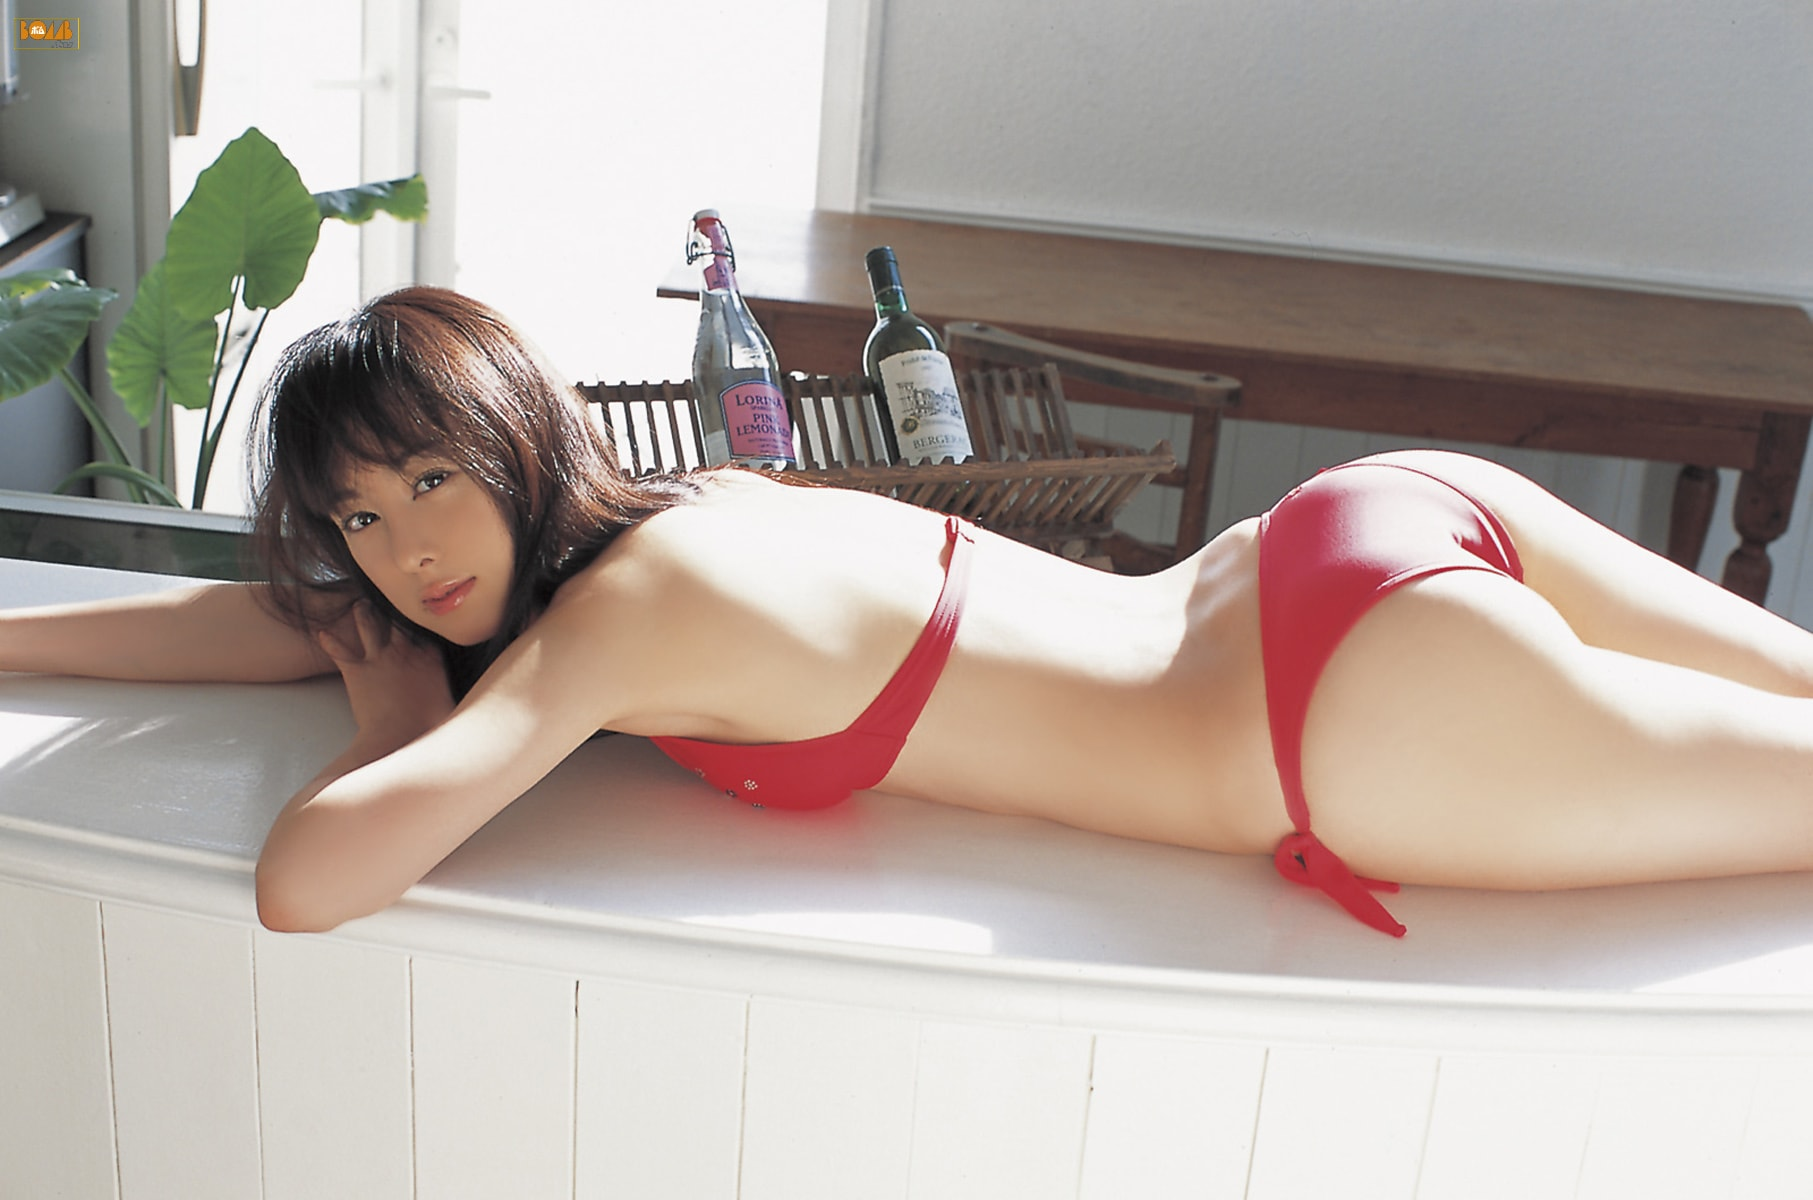 秋山莉奈 BOMB.tv 2007.03 Rina Akiyama 70photos